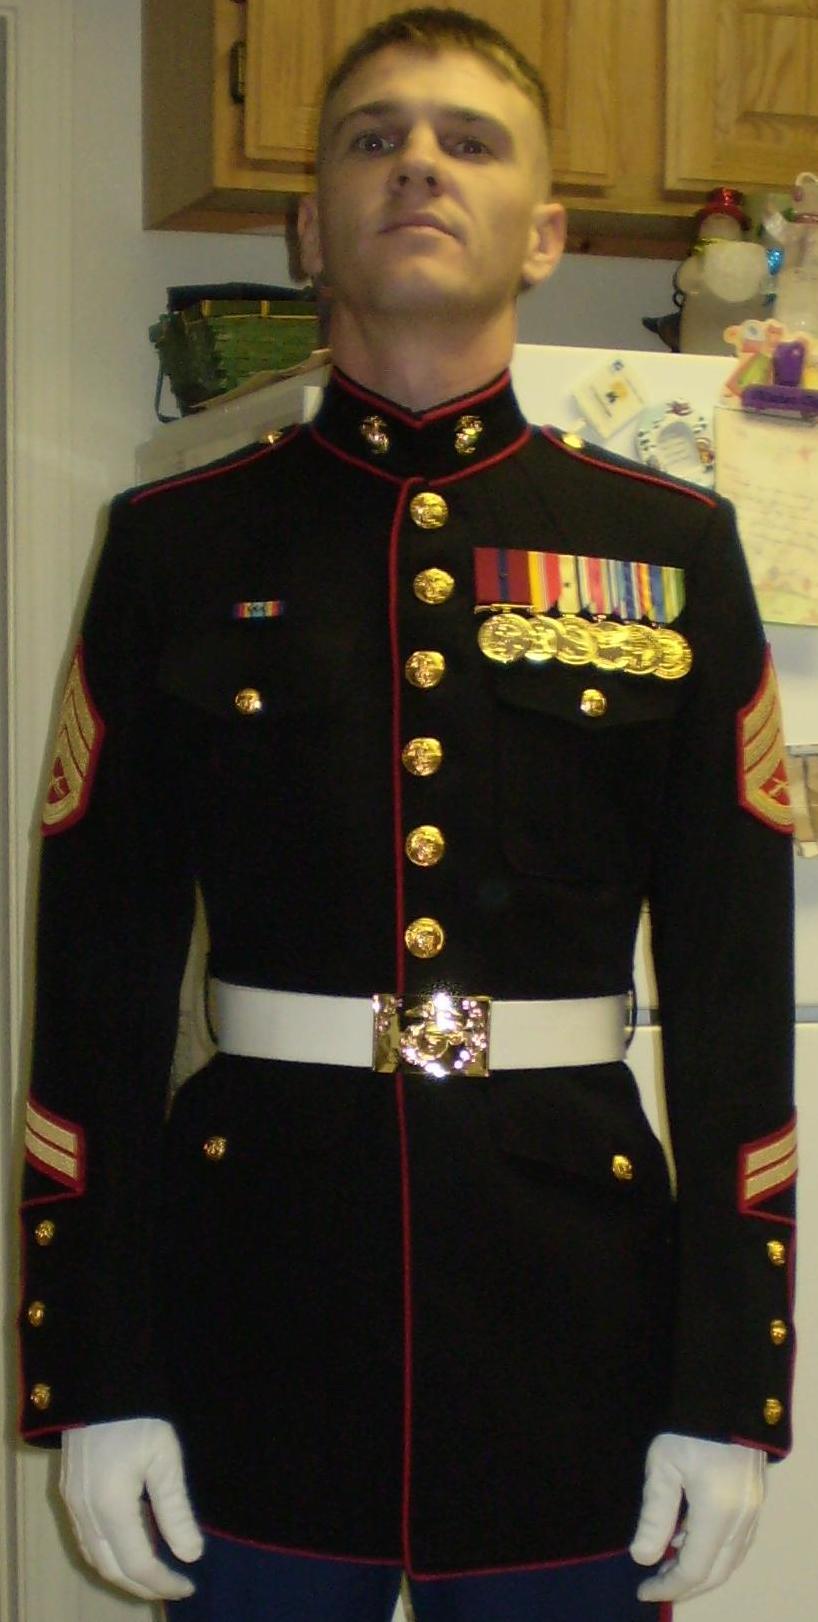 Marine In Dress Uniform 116